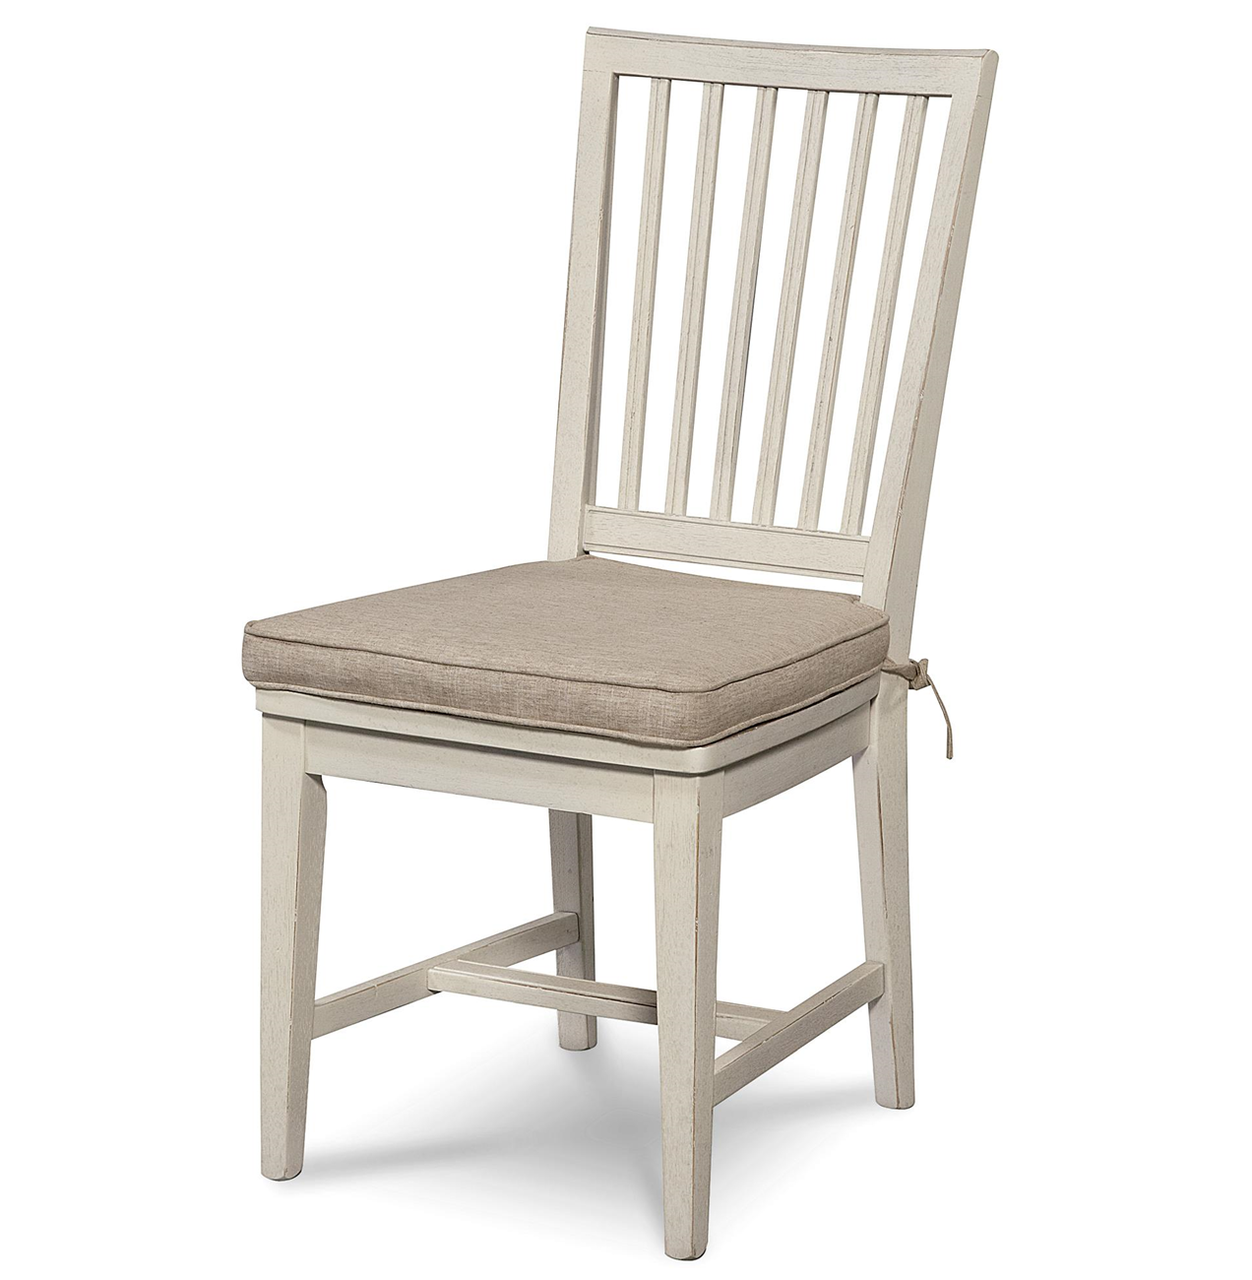 Coastal Beach White Dining Side Chair with Cushion | Zin Home